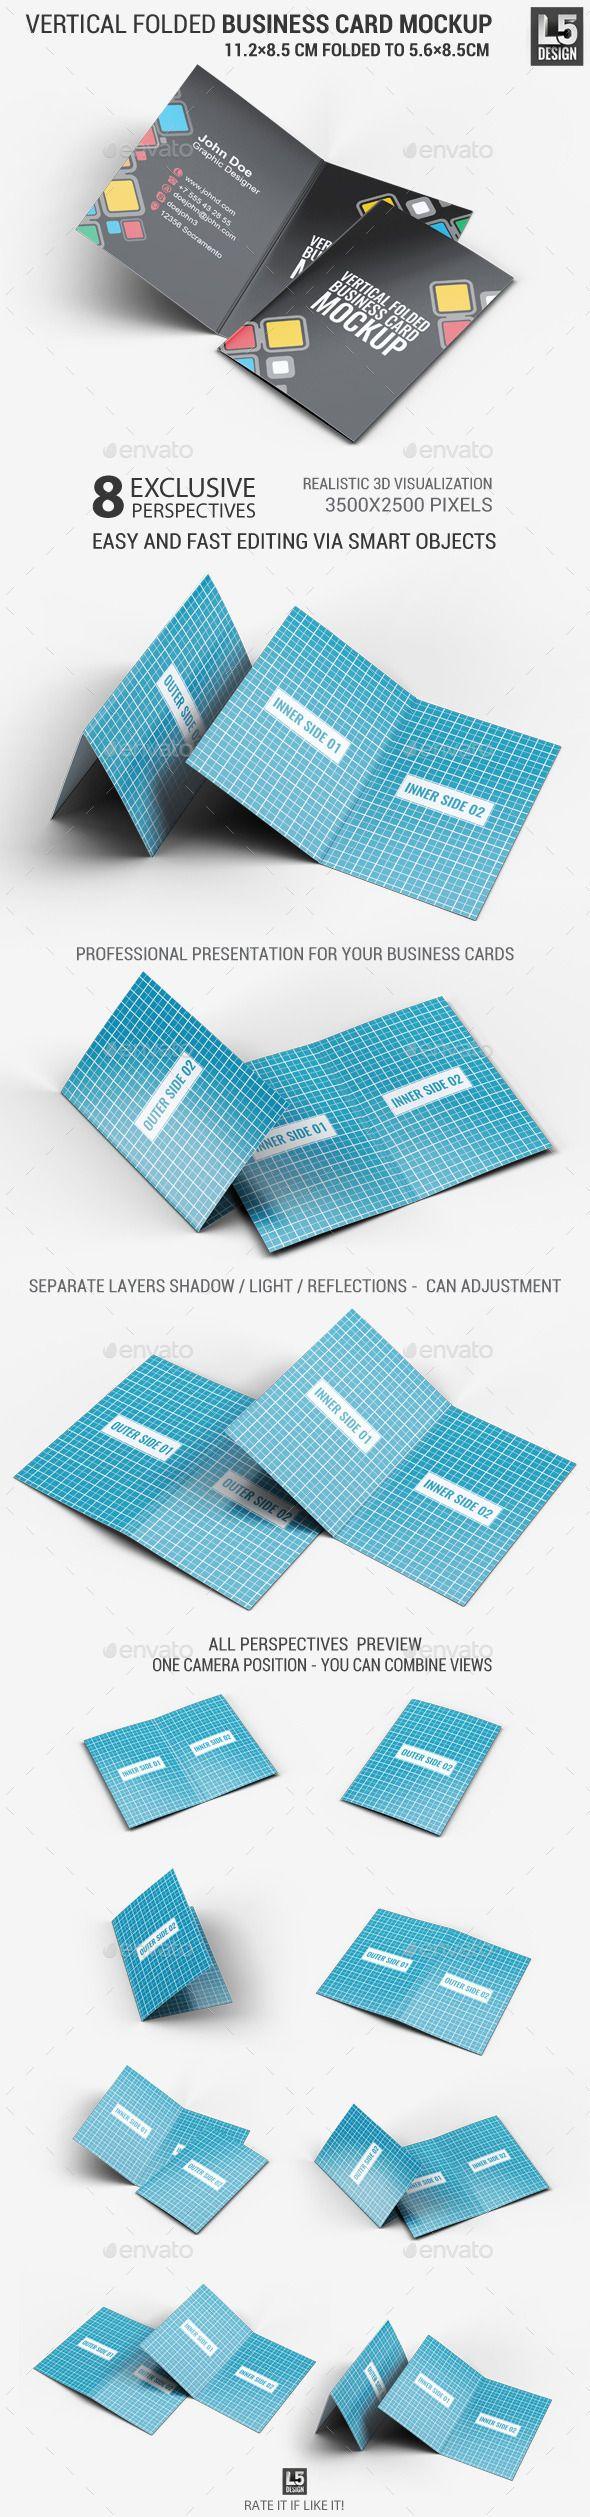 Bi fold card template vaydileforic bi fold card template friedricerecipe Choice Image